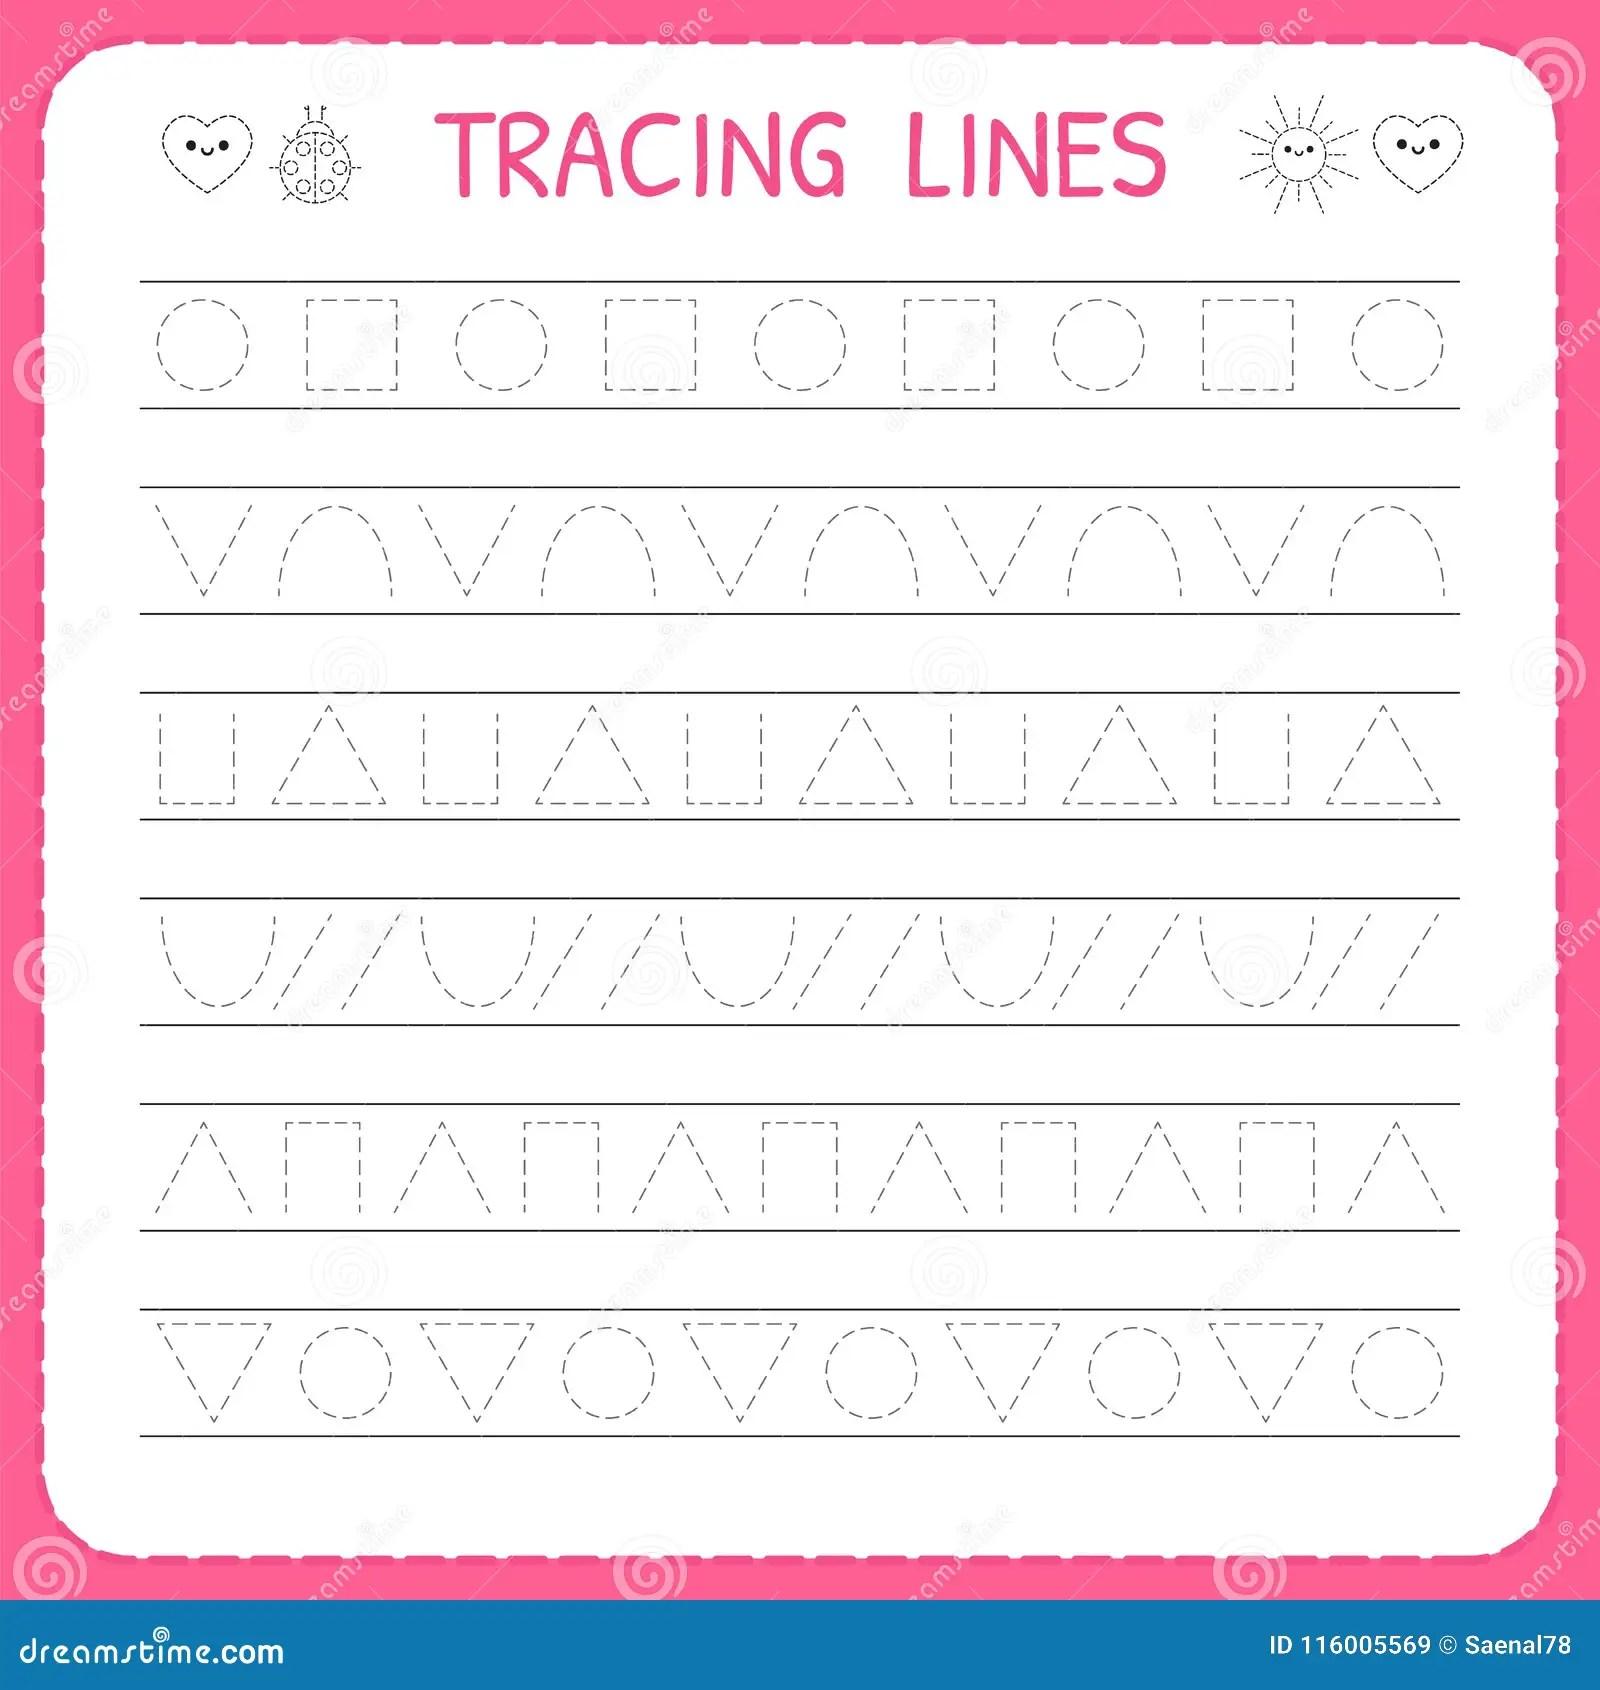 hight resolution of Basic Writing. Trace Line Worksheet For Kids. Preschool Or Kindergarten  Worksheet. Working Pages For Children Stock Vector - Illustration of dash